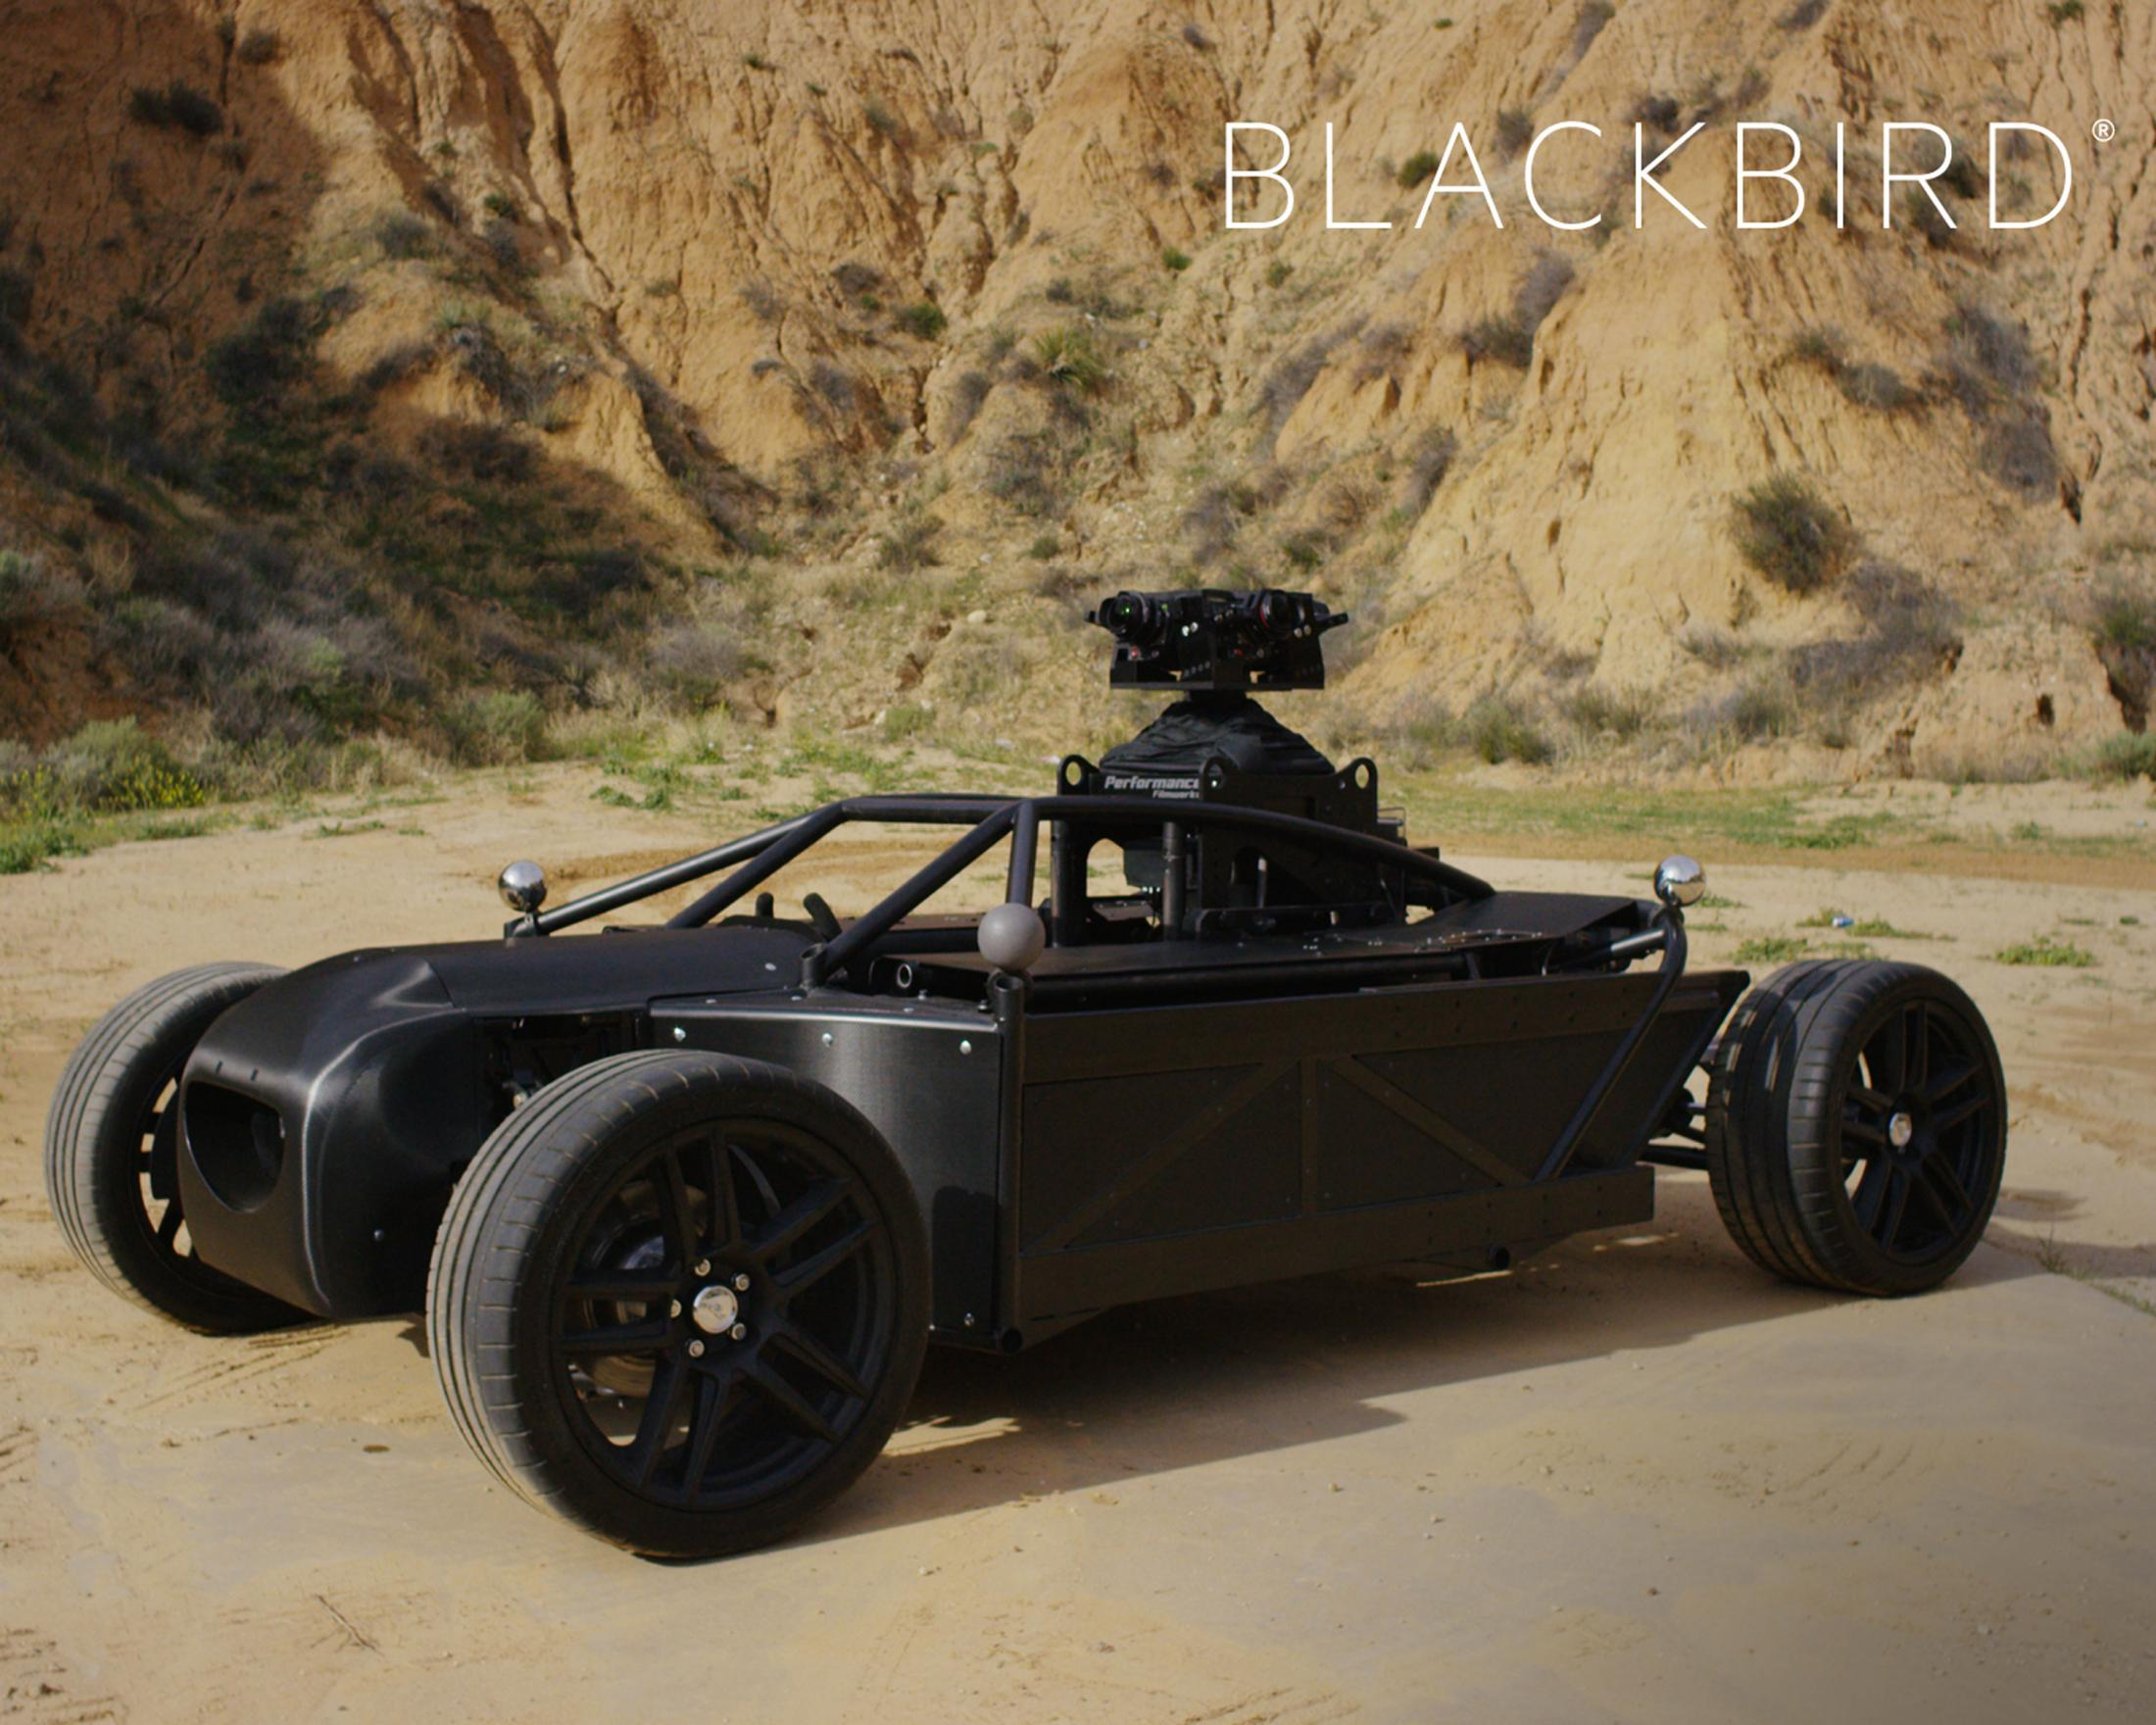 Thumbnail for The Mill Blackbird